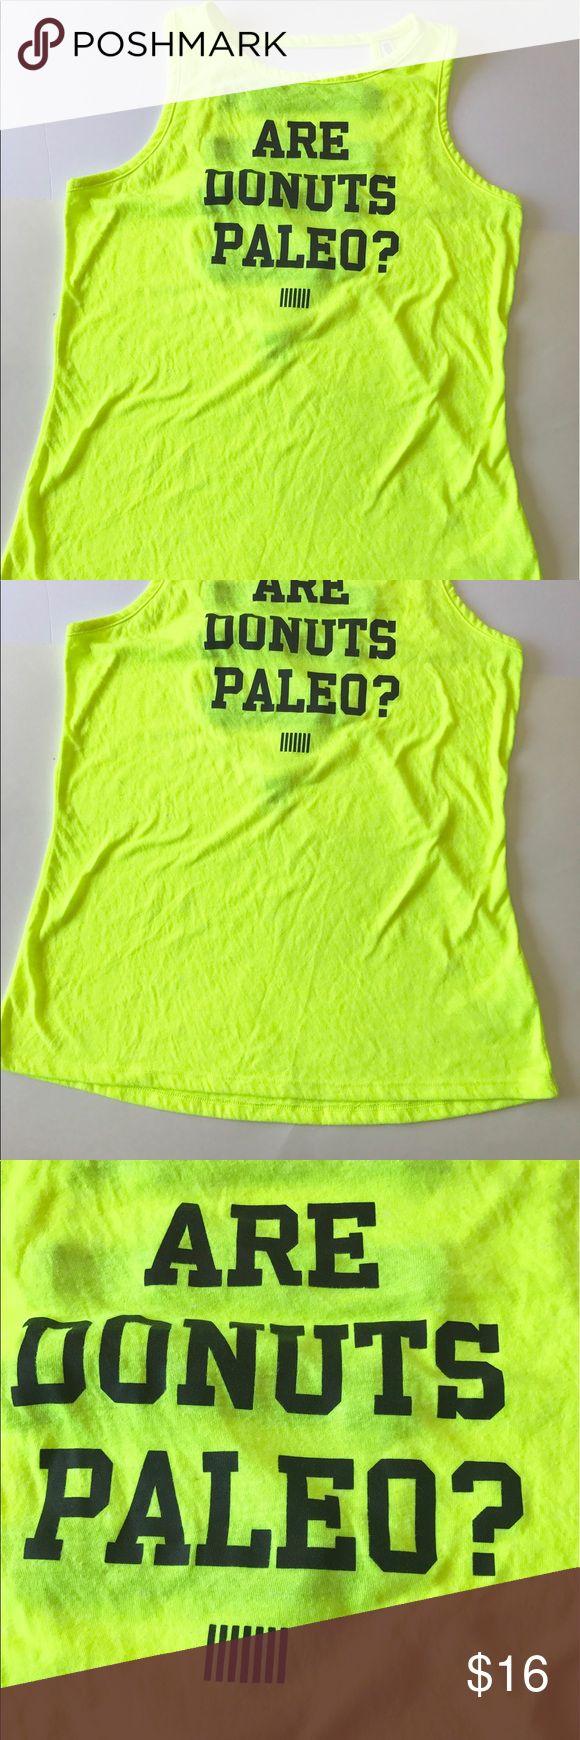 VSX are donuts paleo? Tank top M Victoria secret neon yellow top . Size medium Victoria's Secret Tops Tank Tops